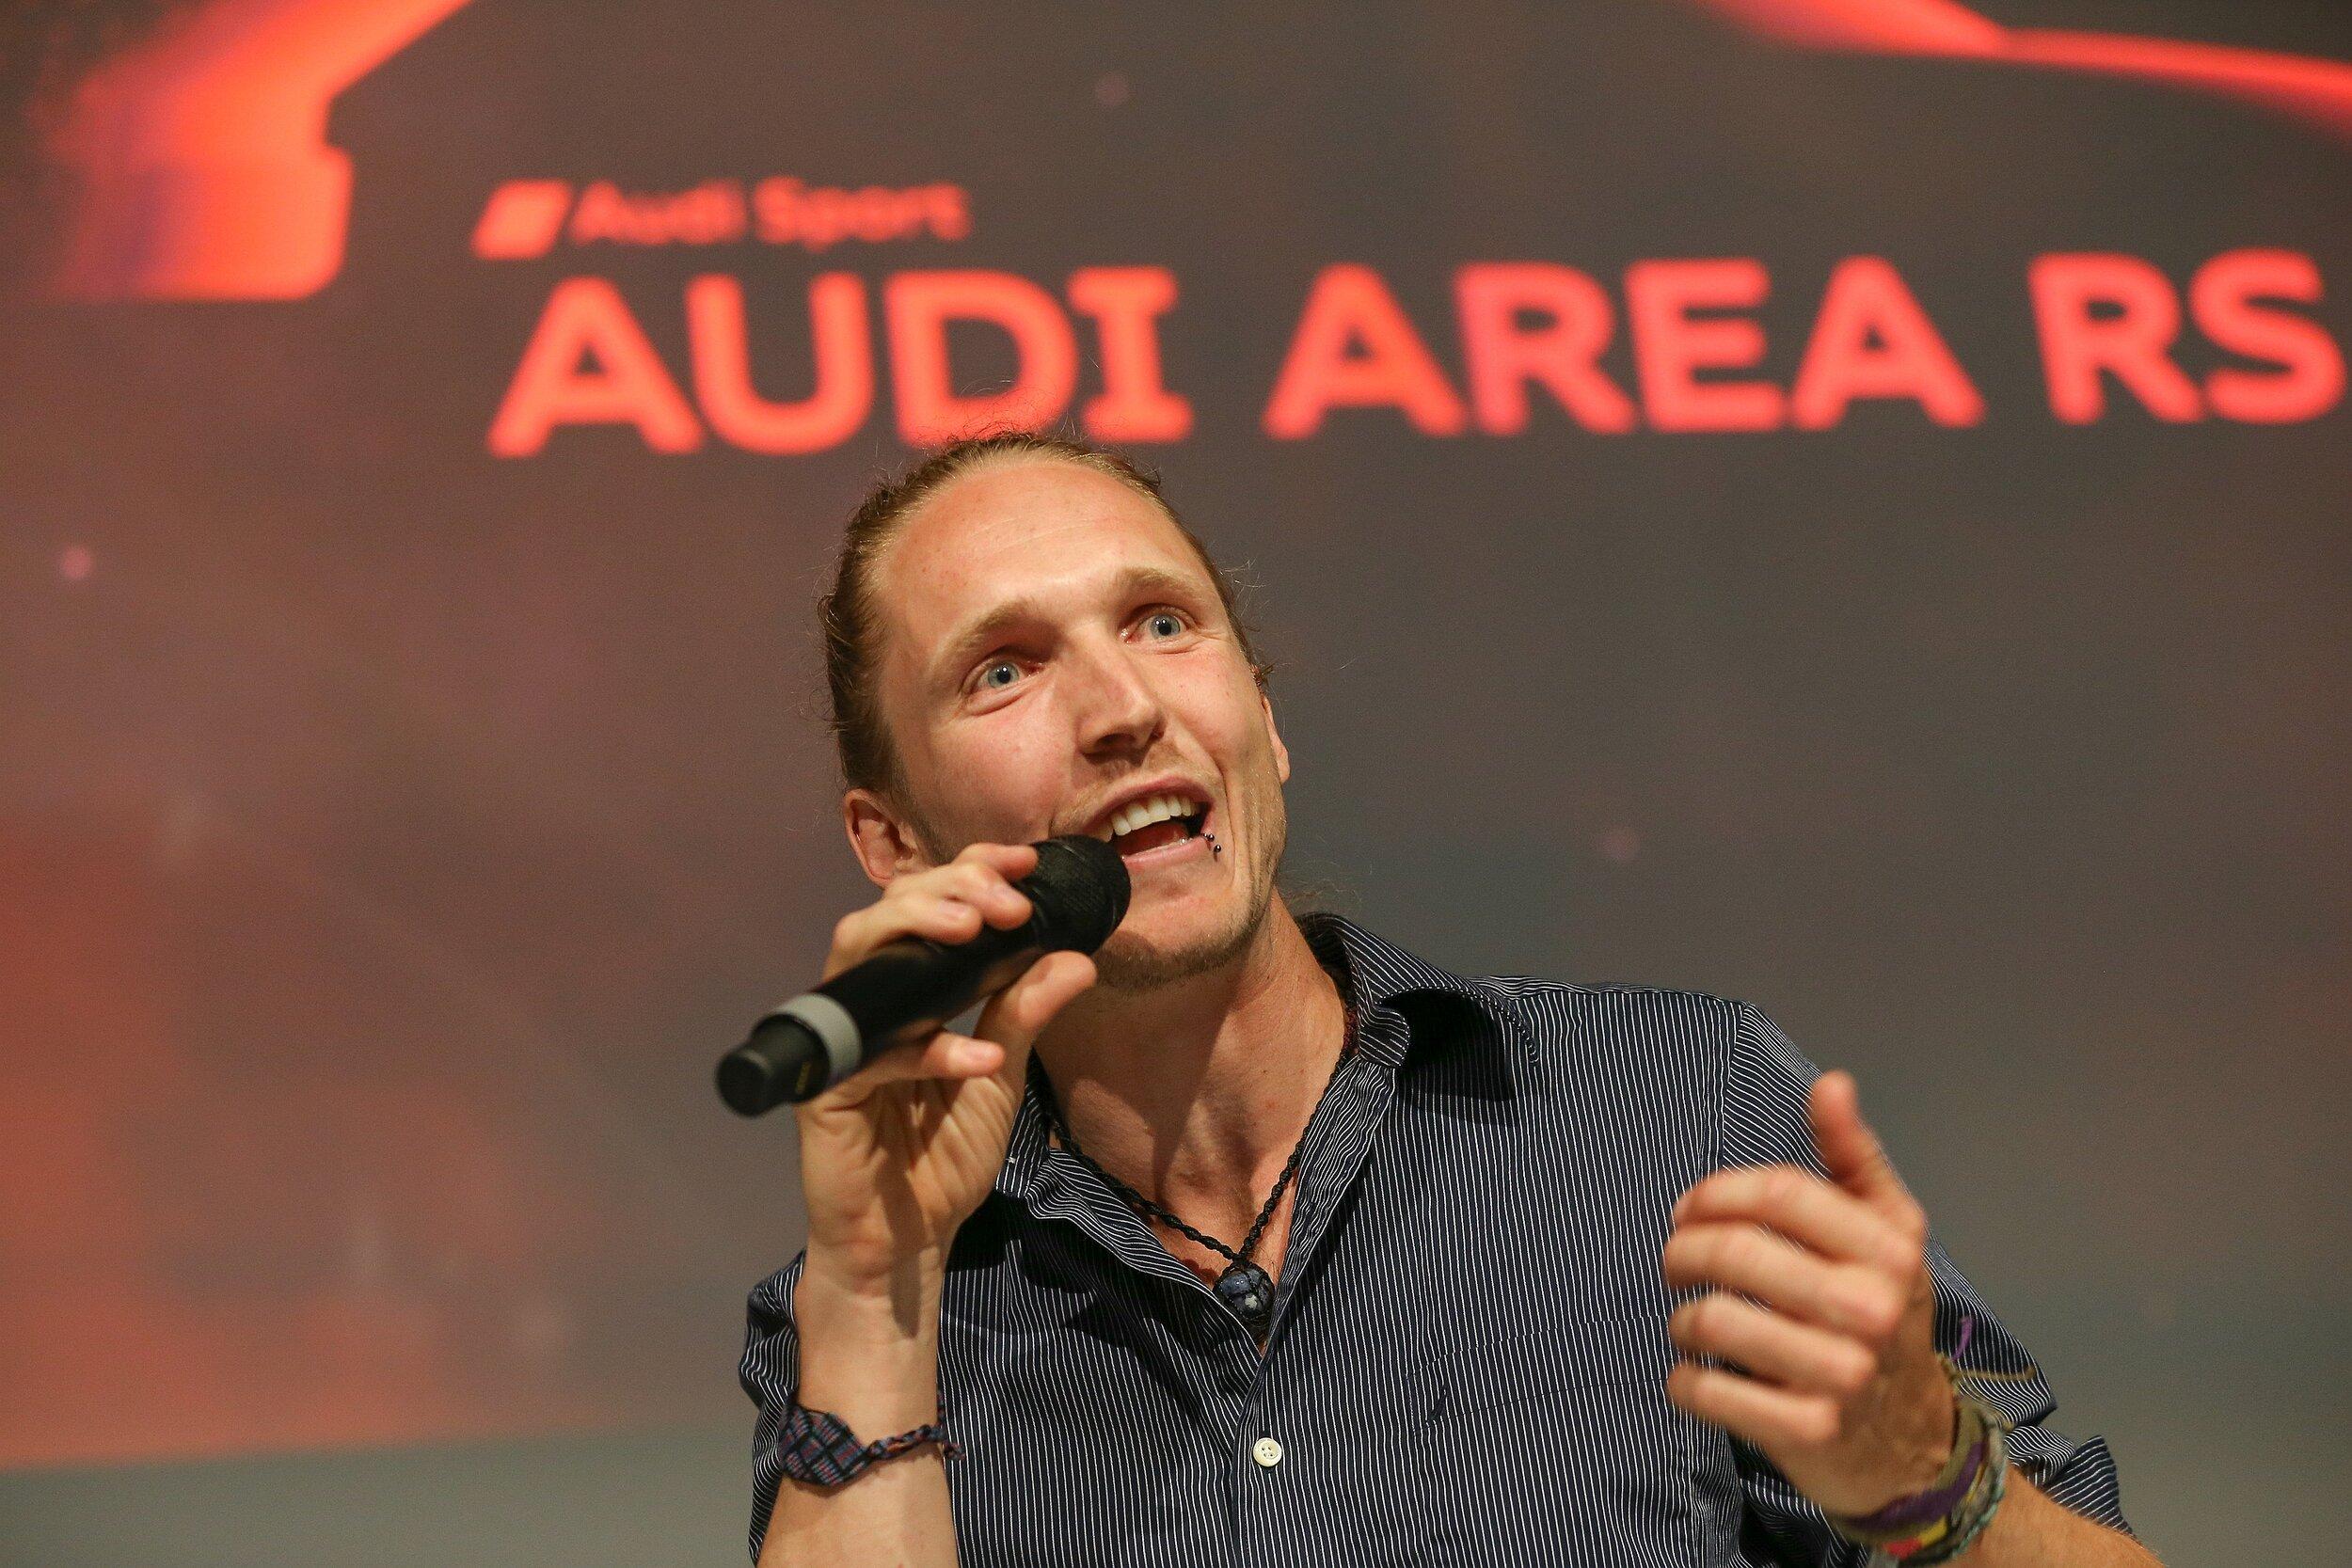 Niklas-Vortrag-bei-AUDI.png